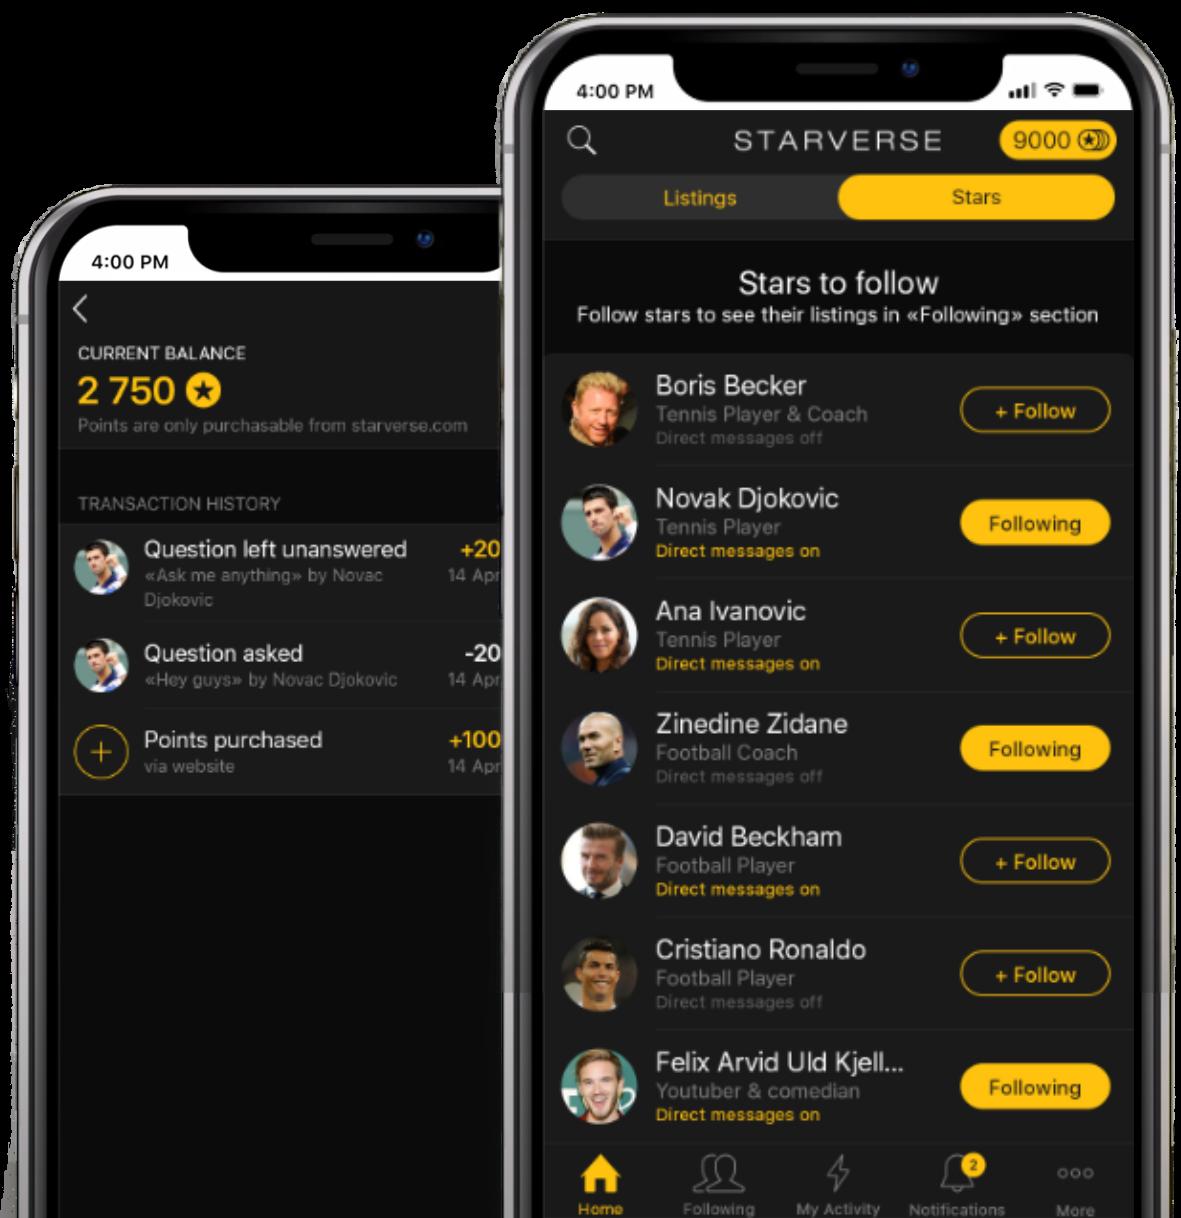 Starverse is Mobile App